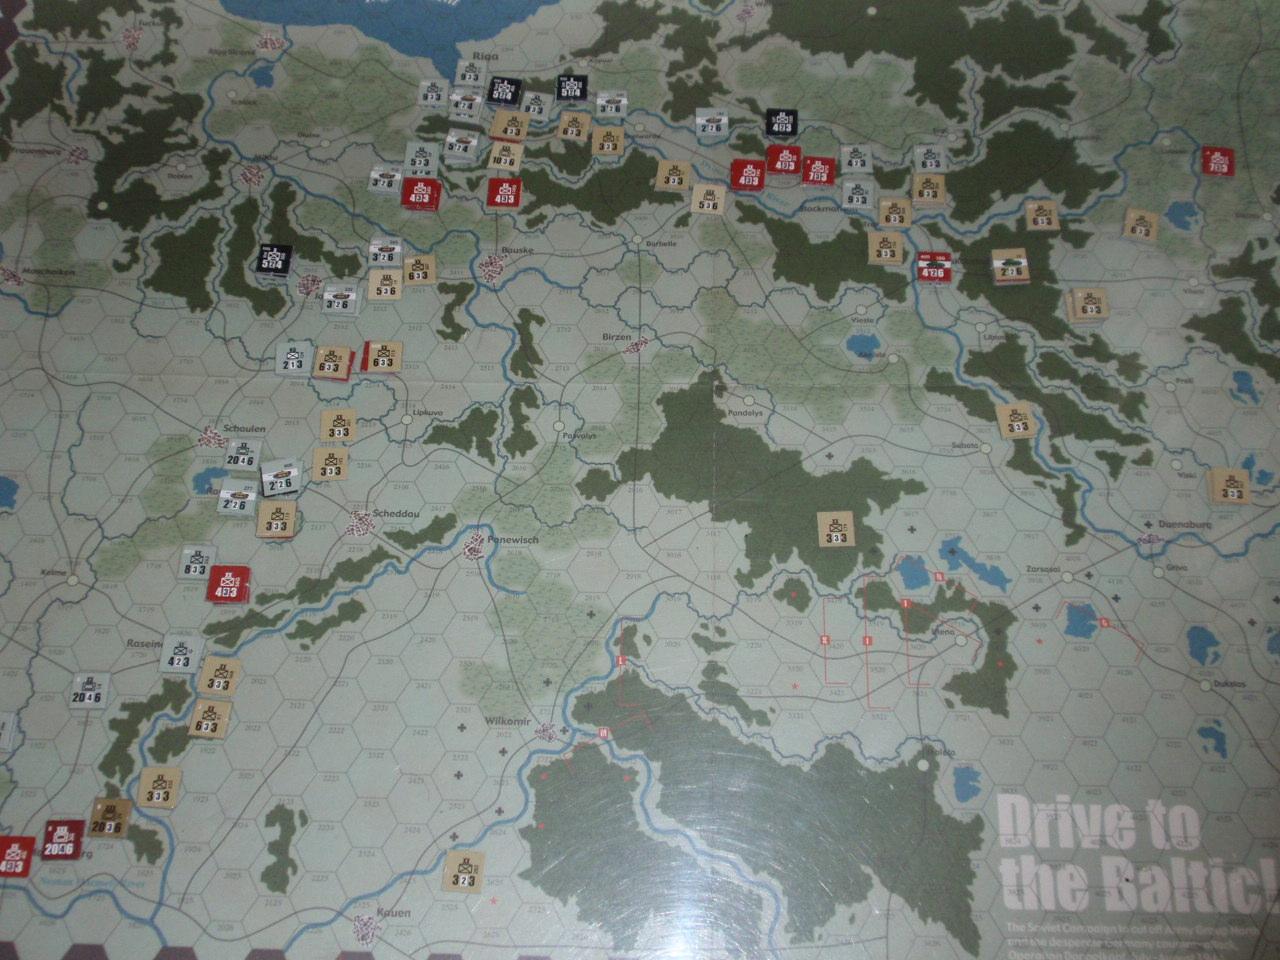 MIH/CMJ「Drive to the Baltic!」をソロプレイ④_b0162202_2074485.jpg